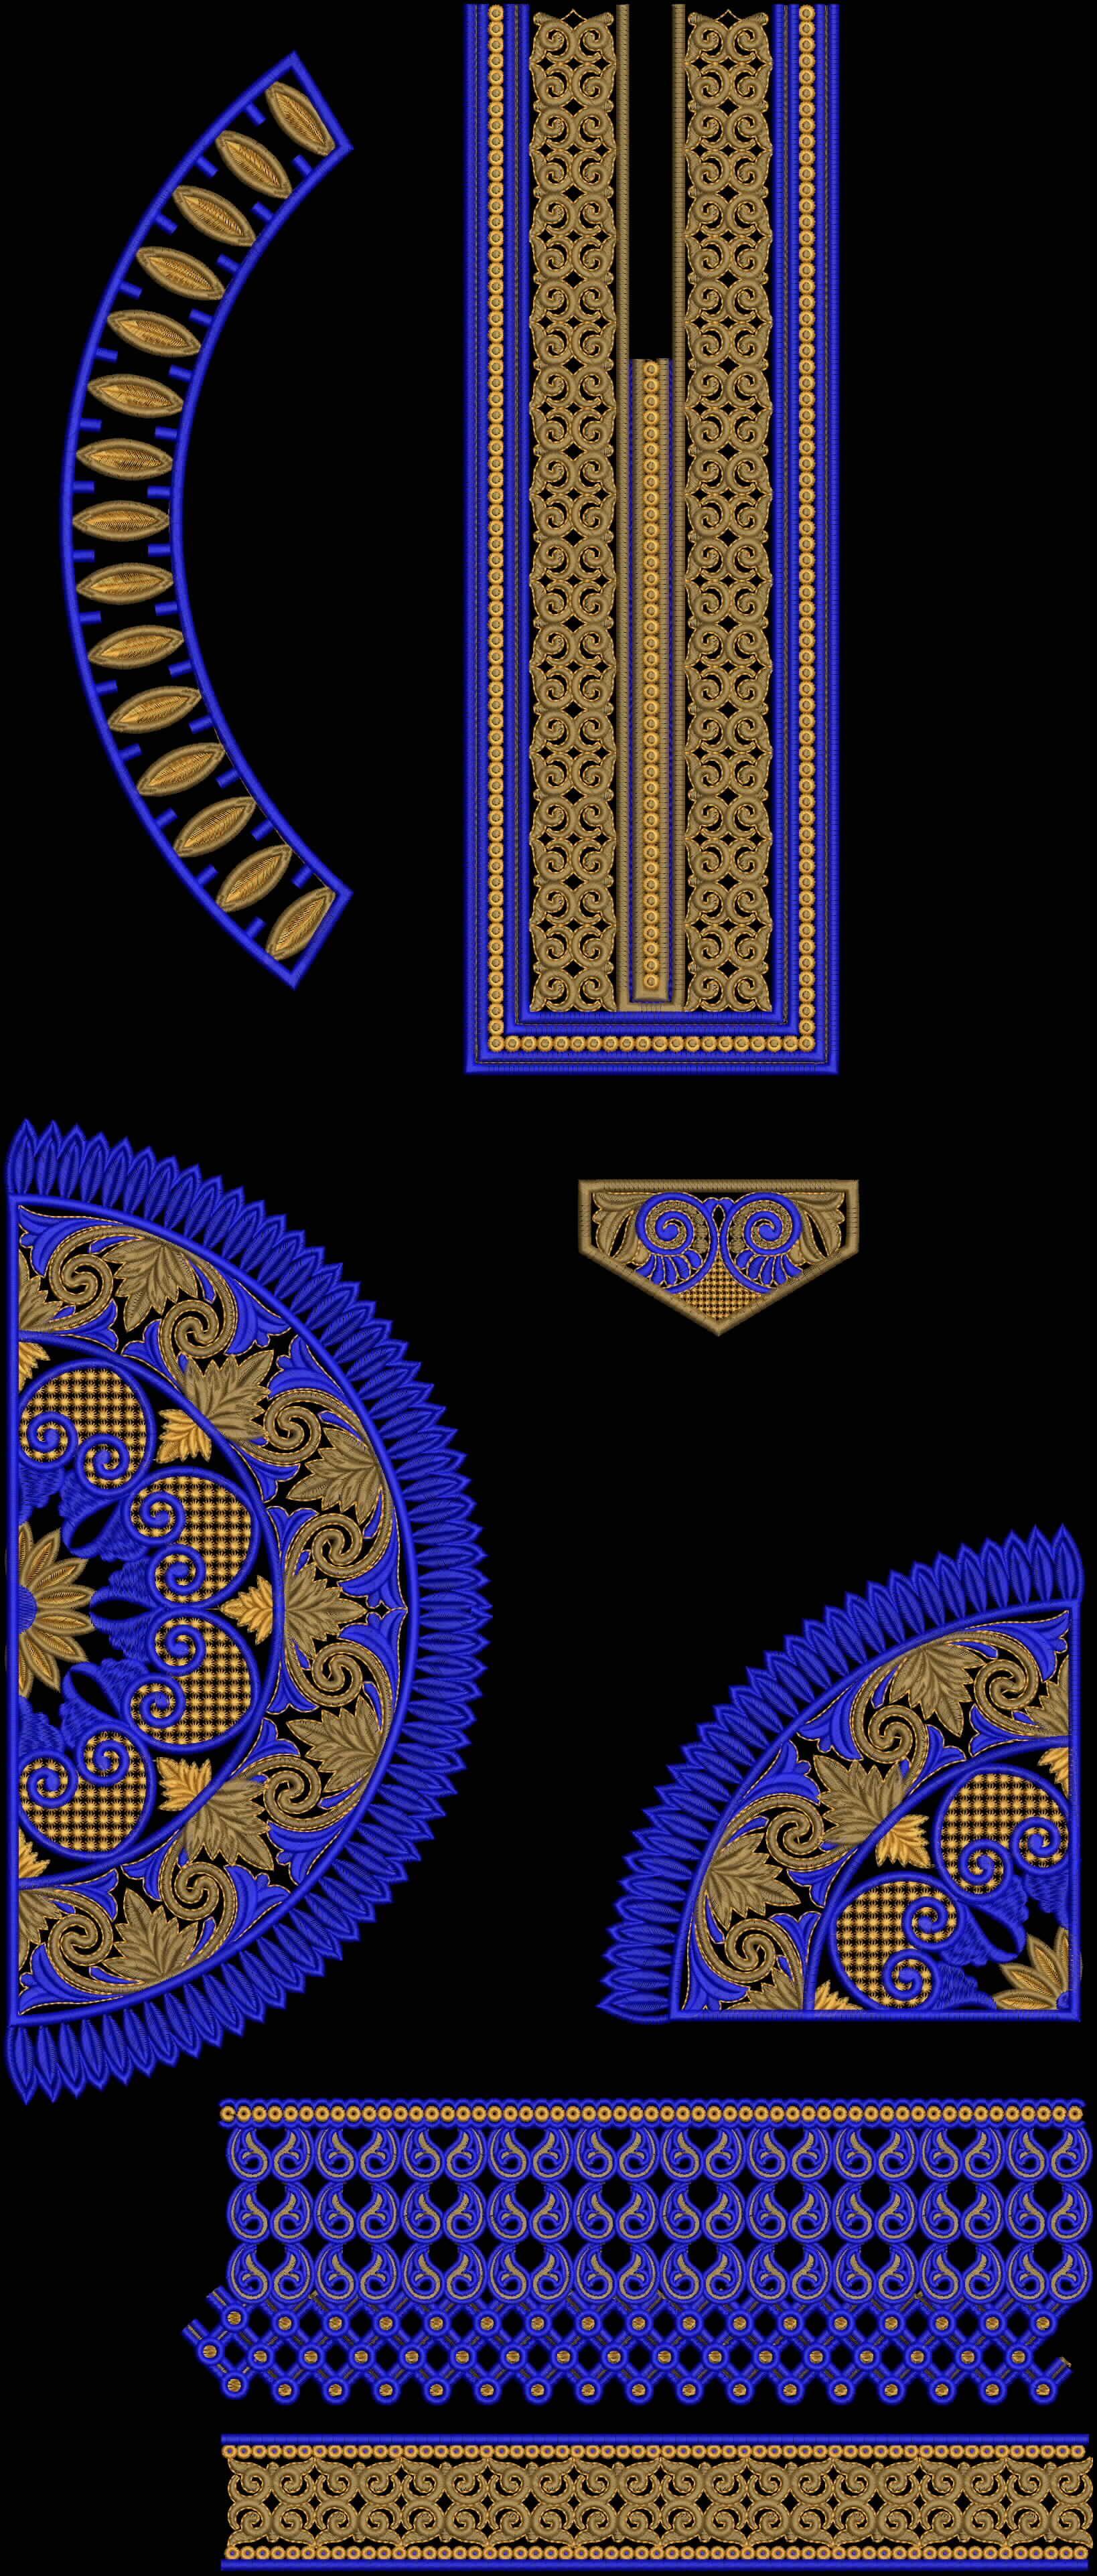 951090cb5 Free embroidery designs for salwar kameez